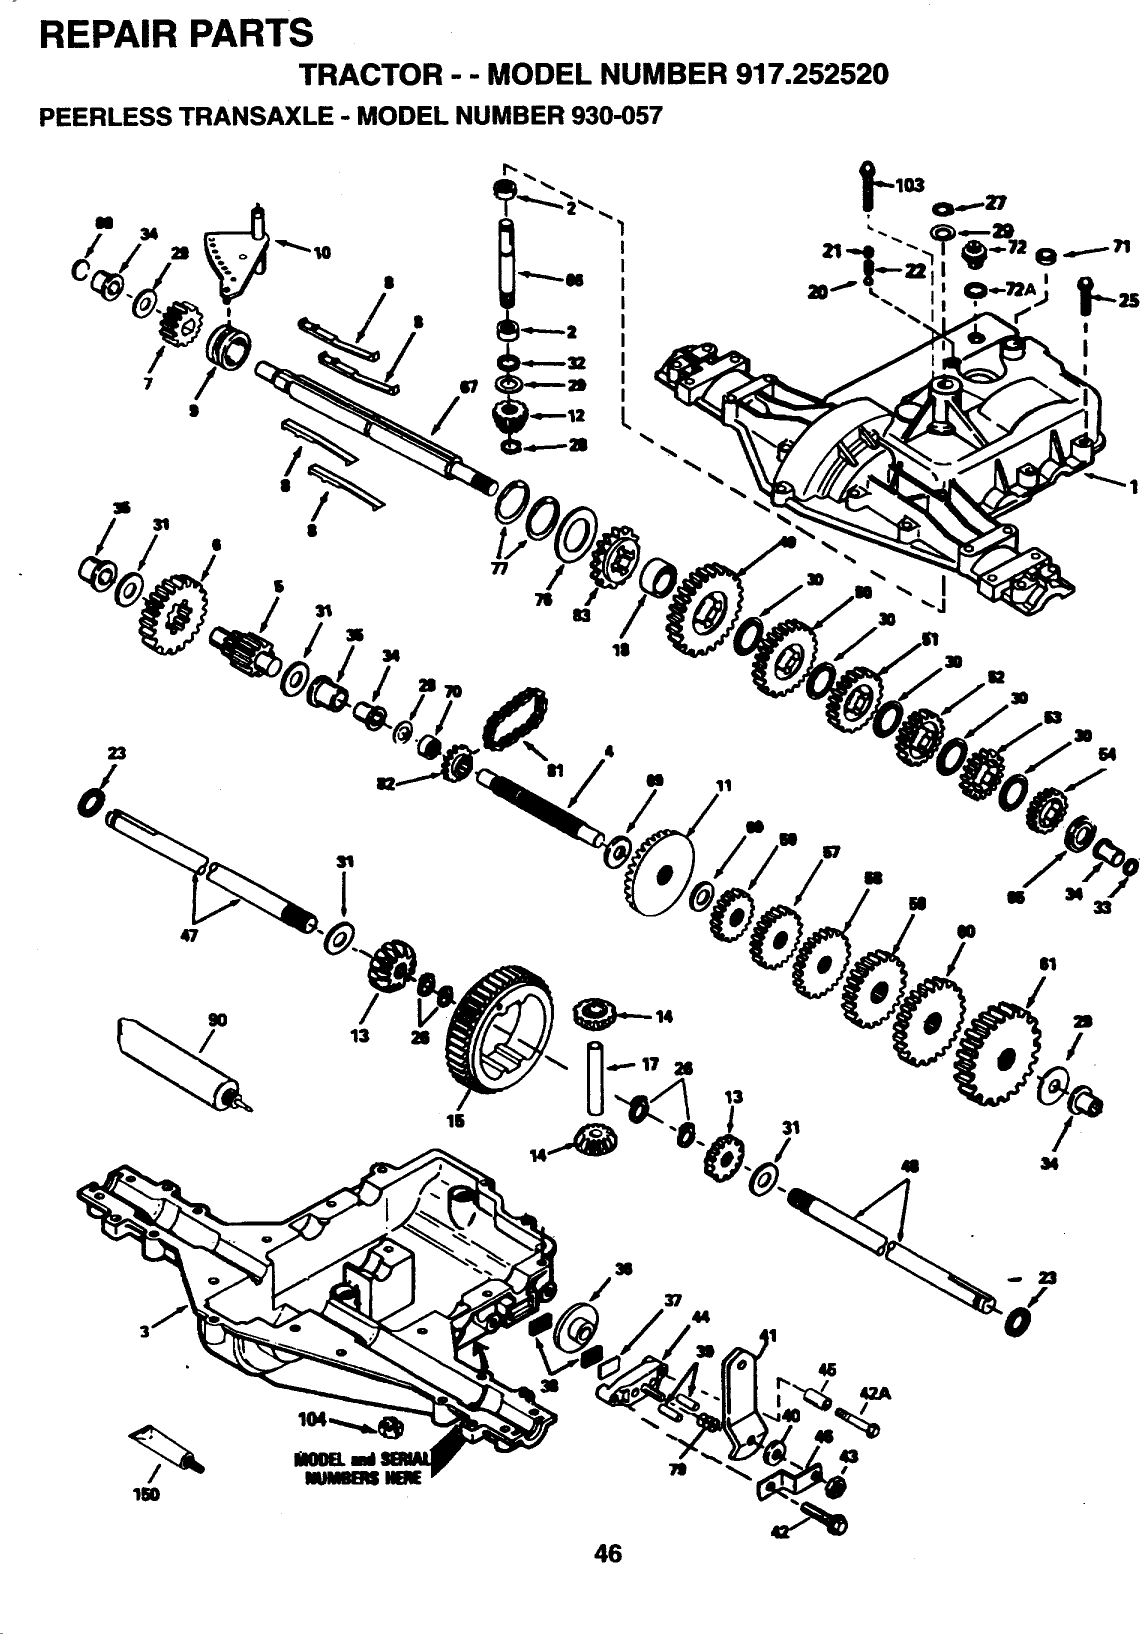 Craftsman 917252520 User Manual LAWN TRACTORS Manuals And